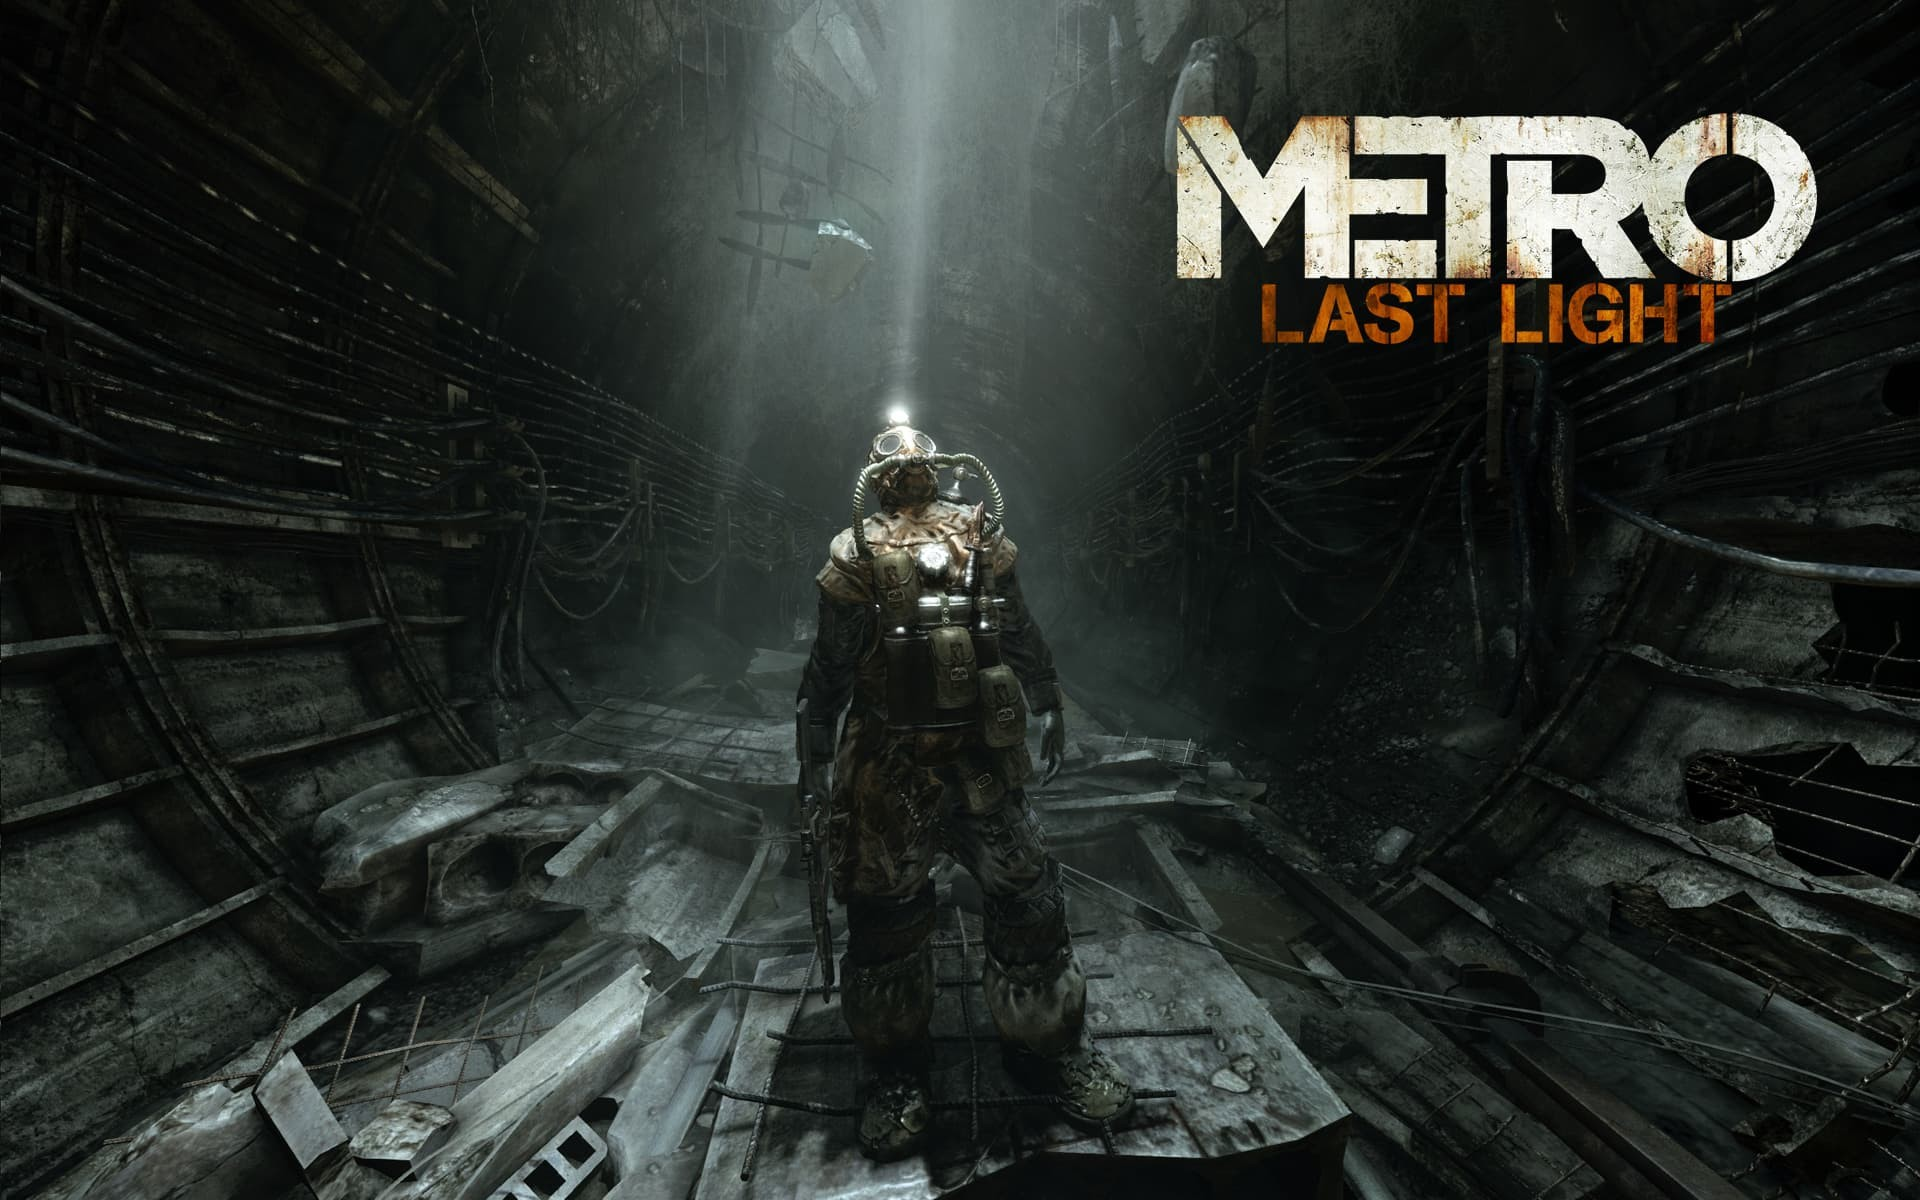 Metro Last Light copertina con logo